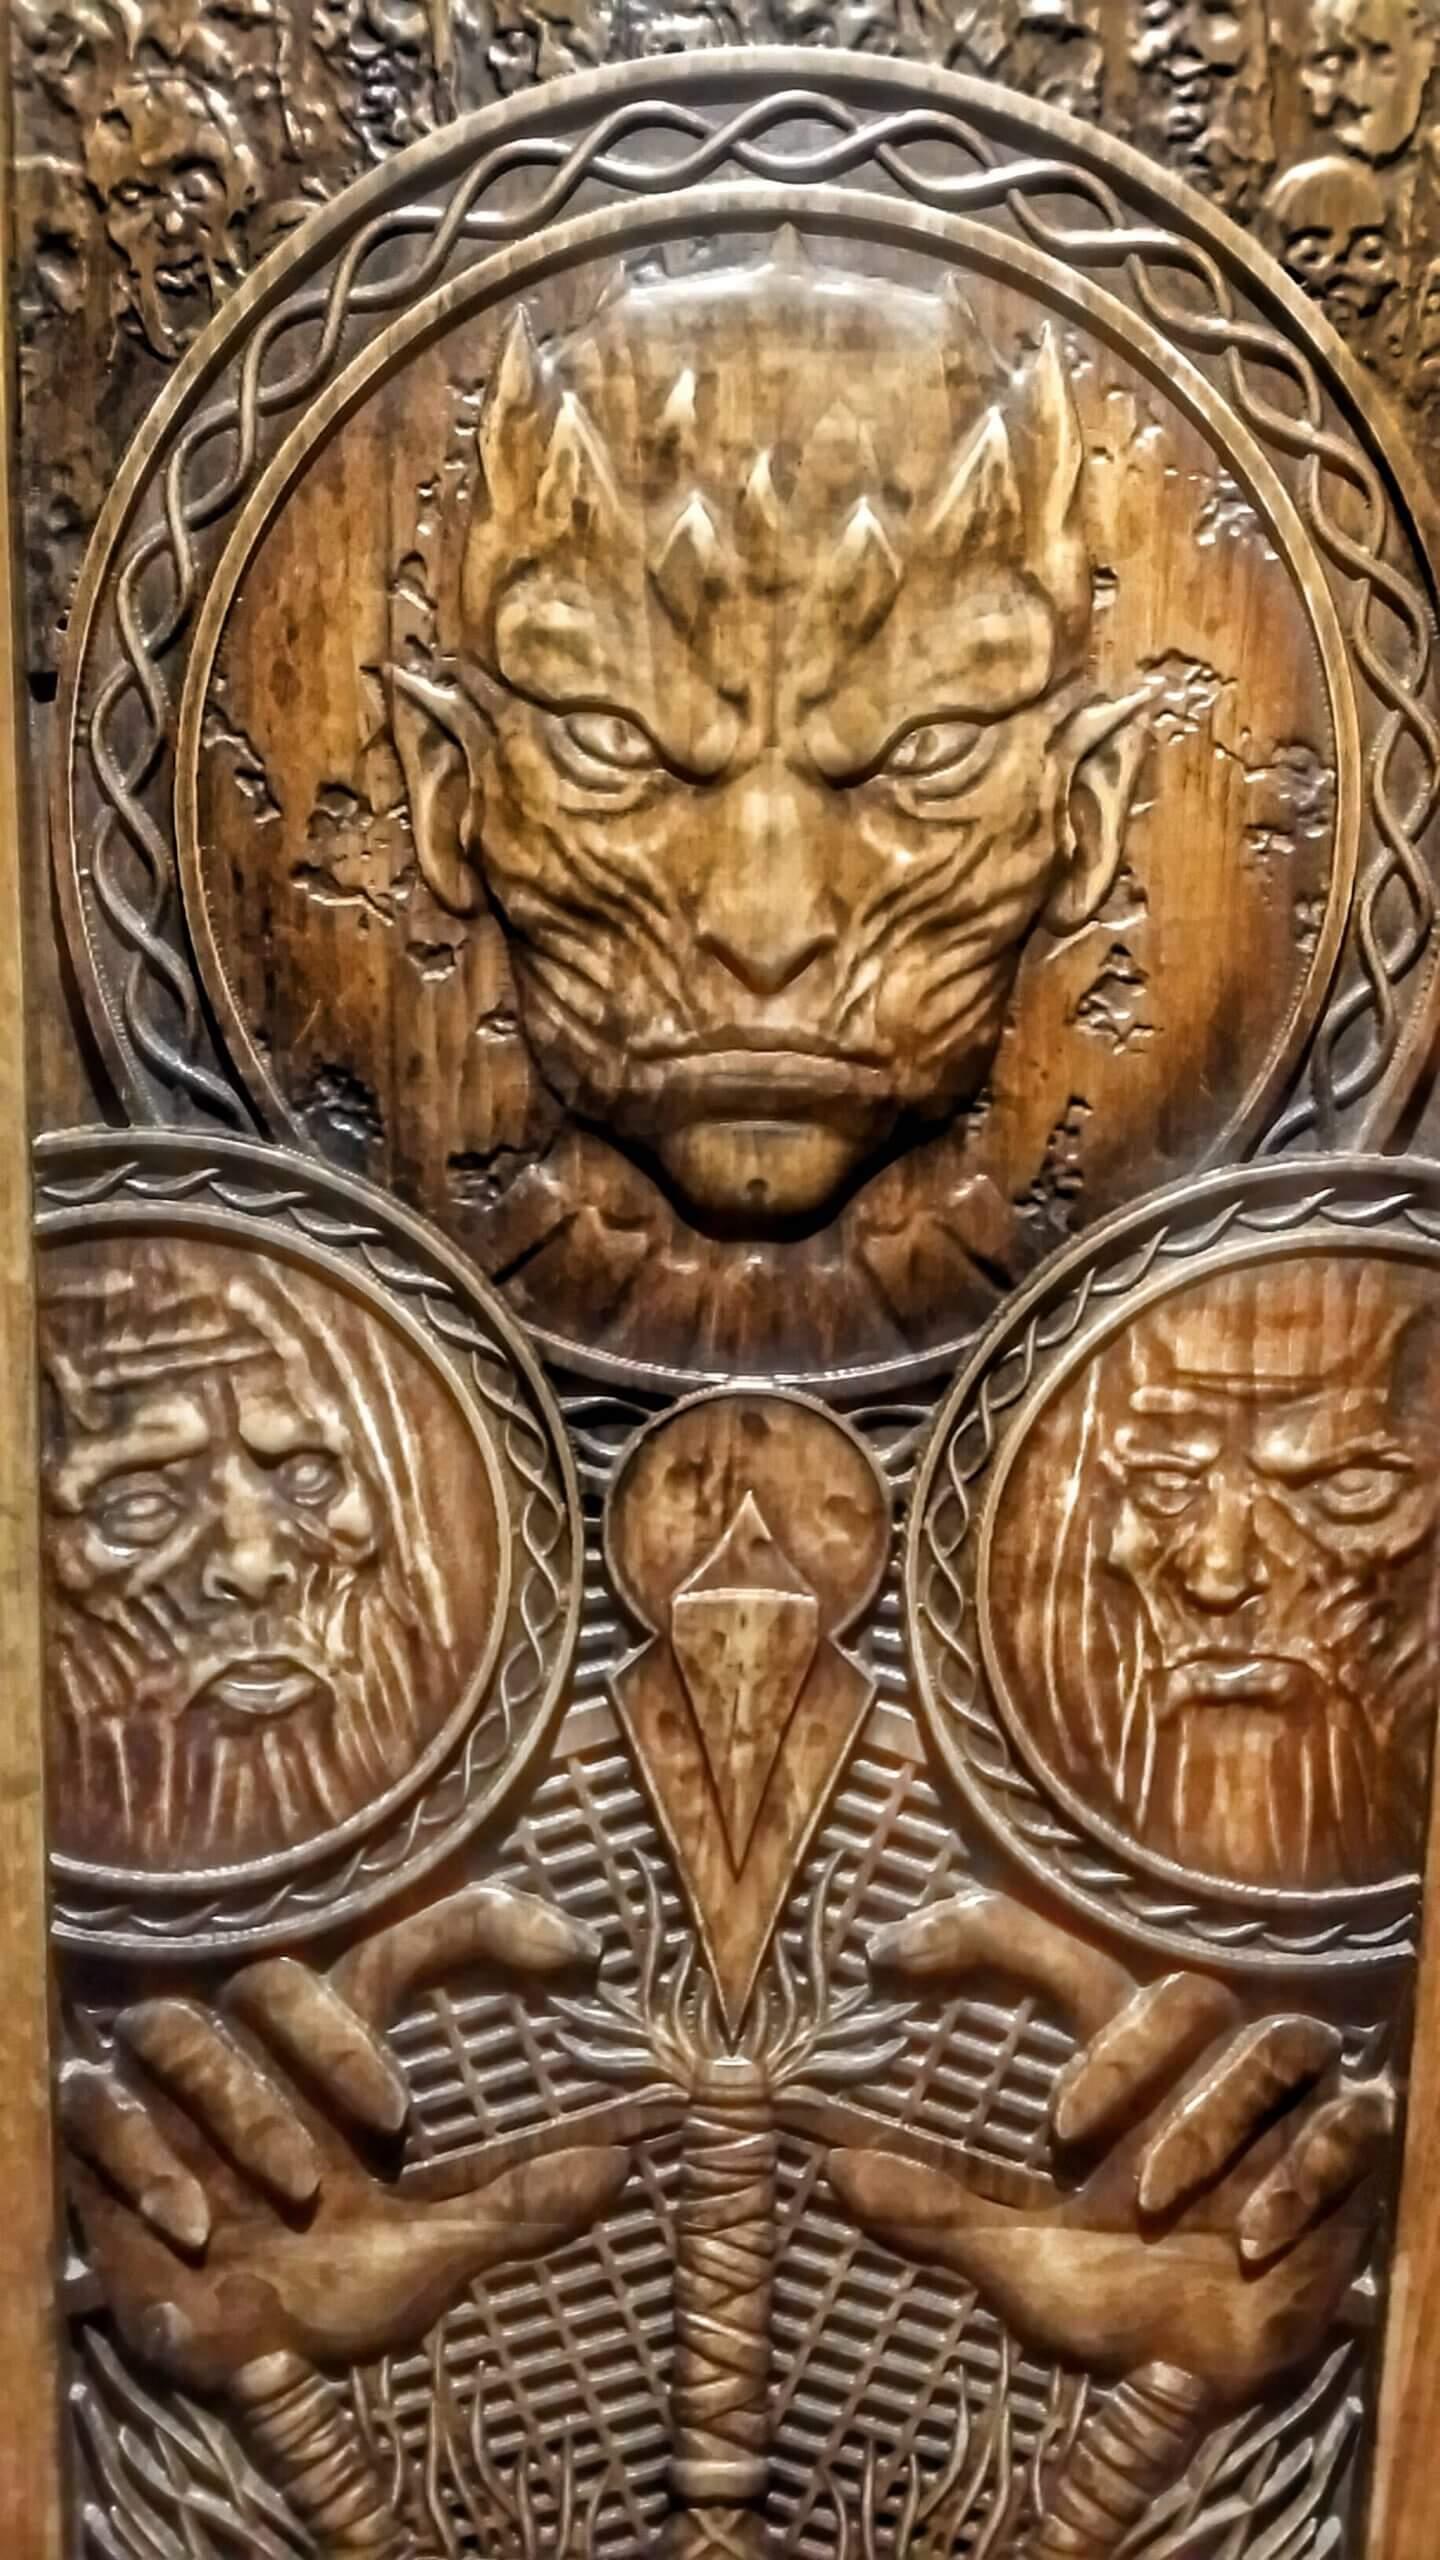 game of thrones doors and food tour where is tara povey top irish travel blog